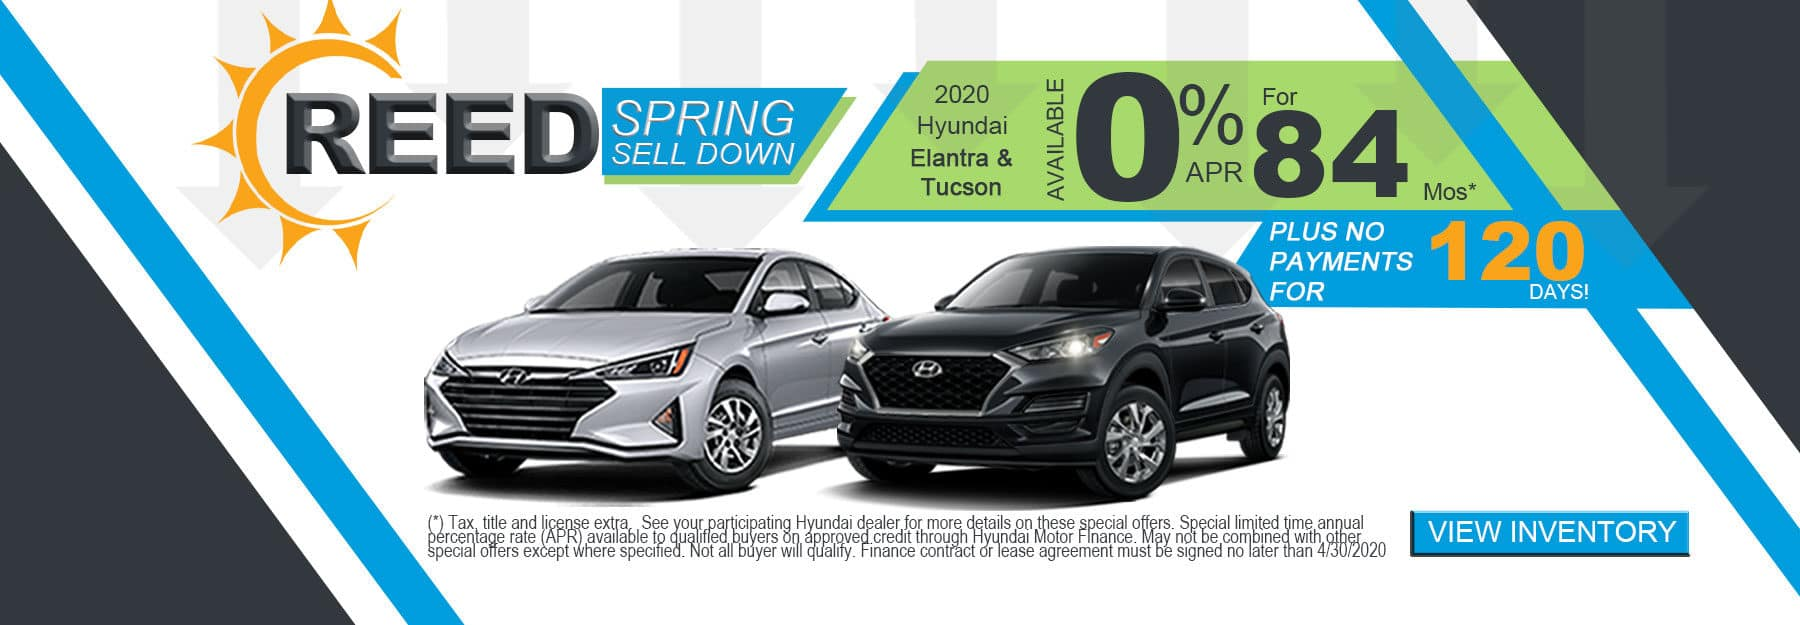 2020 Hyundai Elantra & Tucson